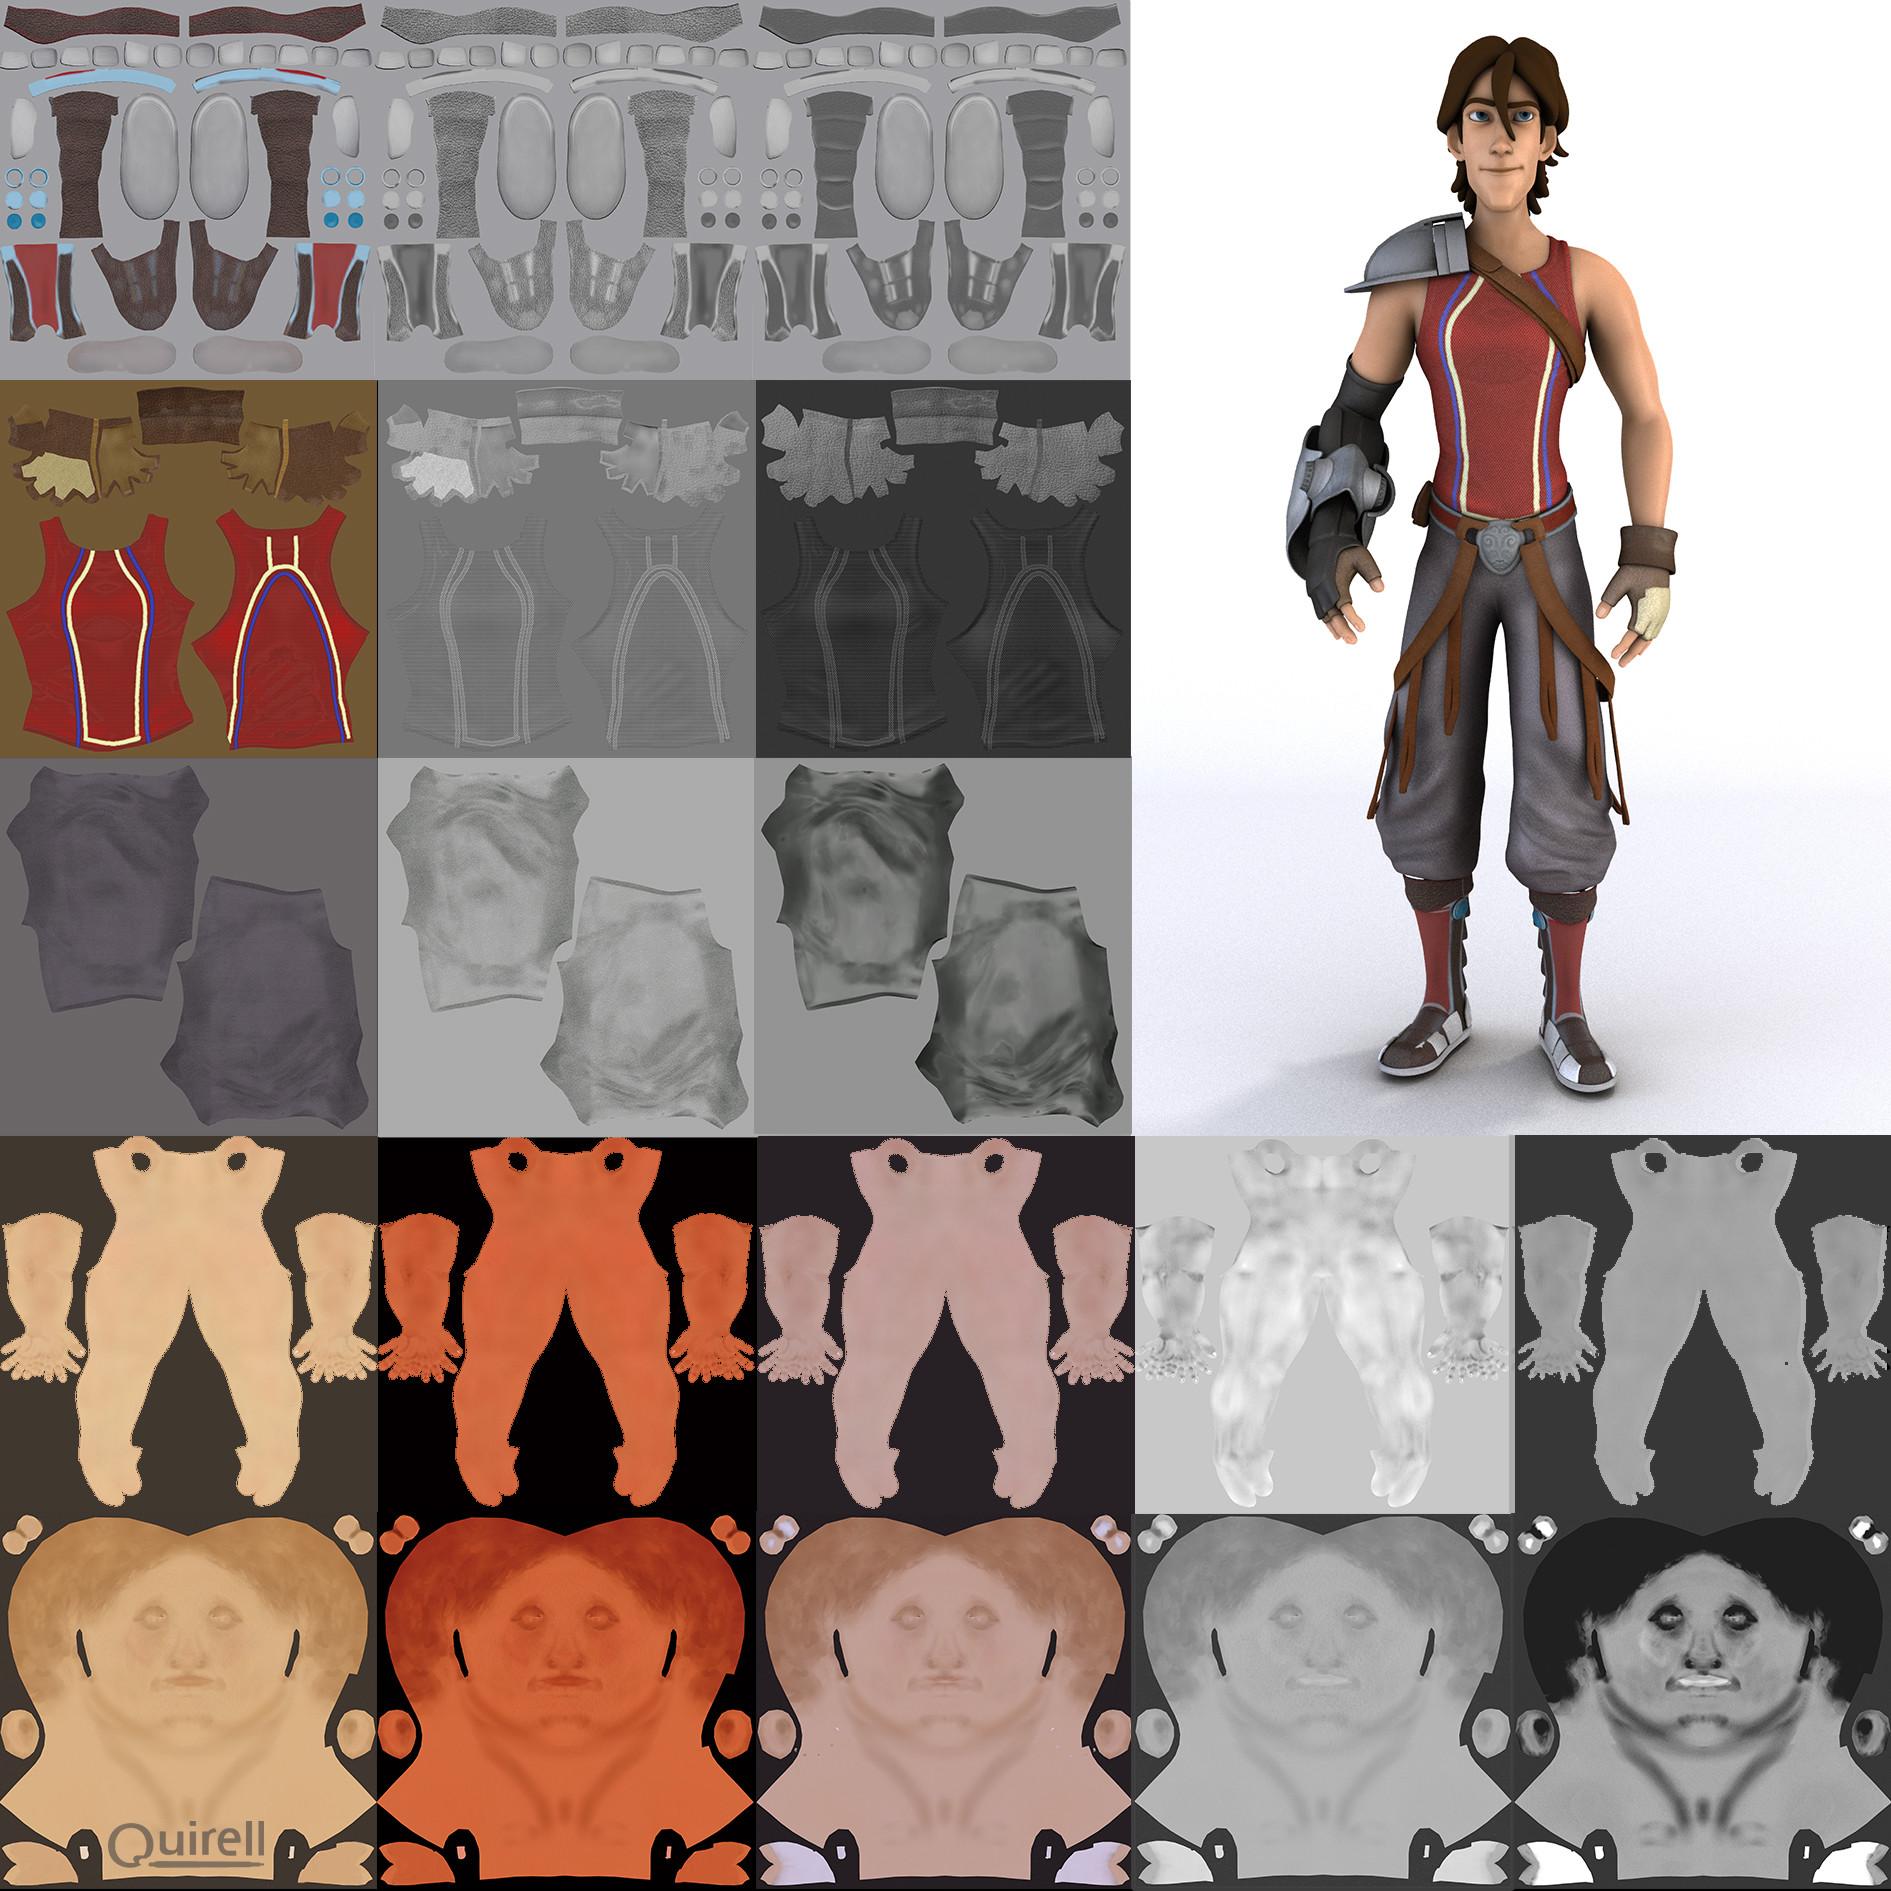 Veronica quirell dar character cartton 2016 texturas cuerpo